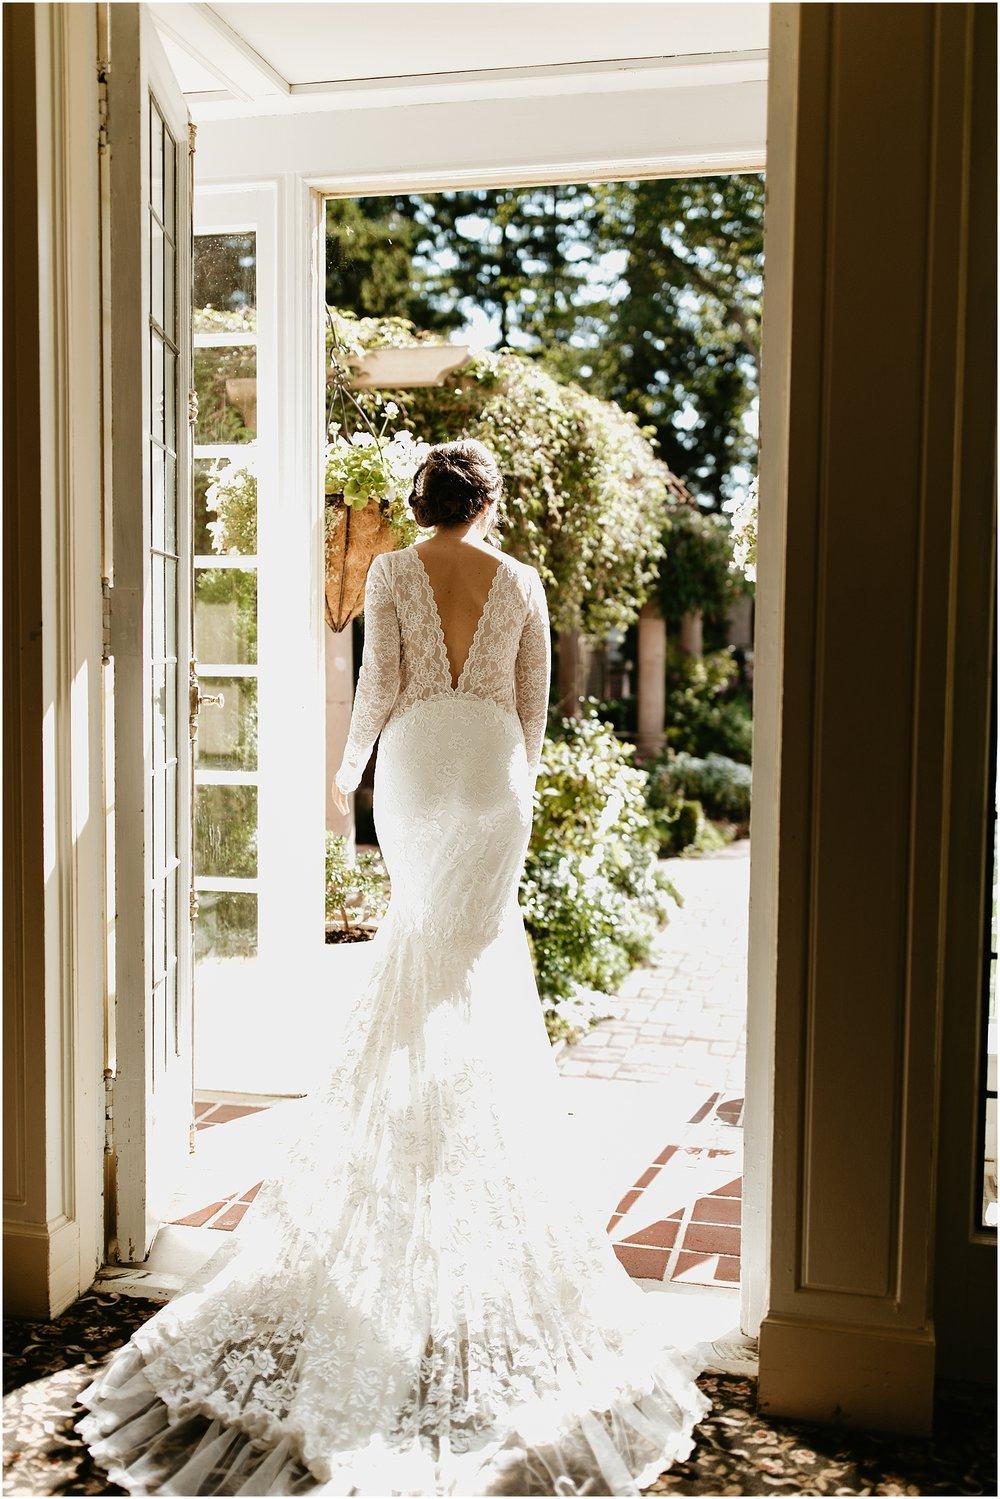 Lairmont Manor Wedding Bellingham Cassie Trottier Photo1014.jpg